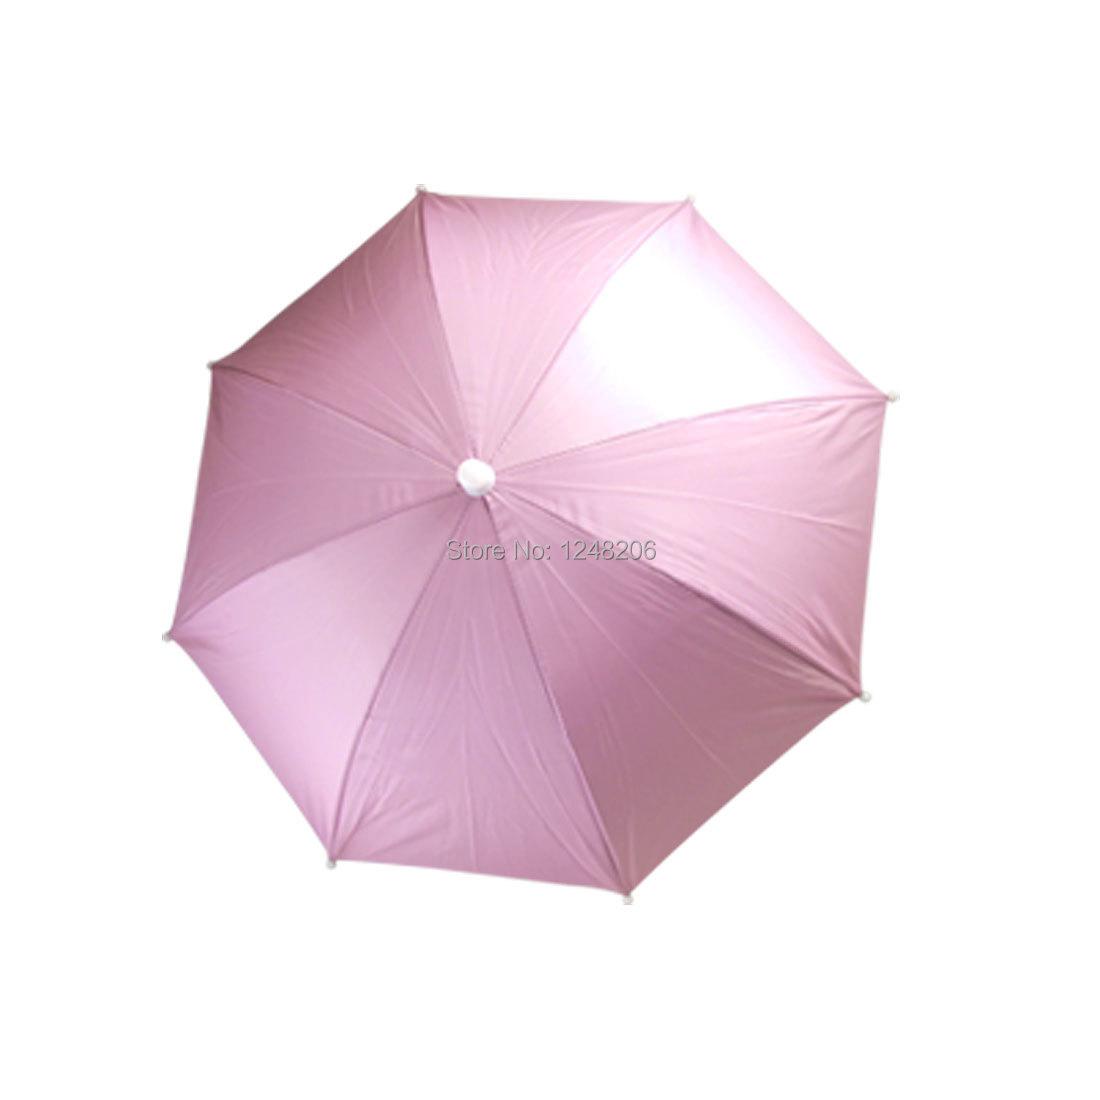 Pink Outdoor Sports Fishing Umbrella Hat Headwear Discount 50(China (Mainland))